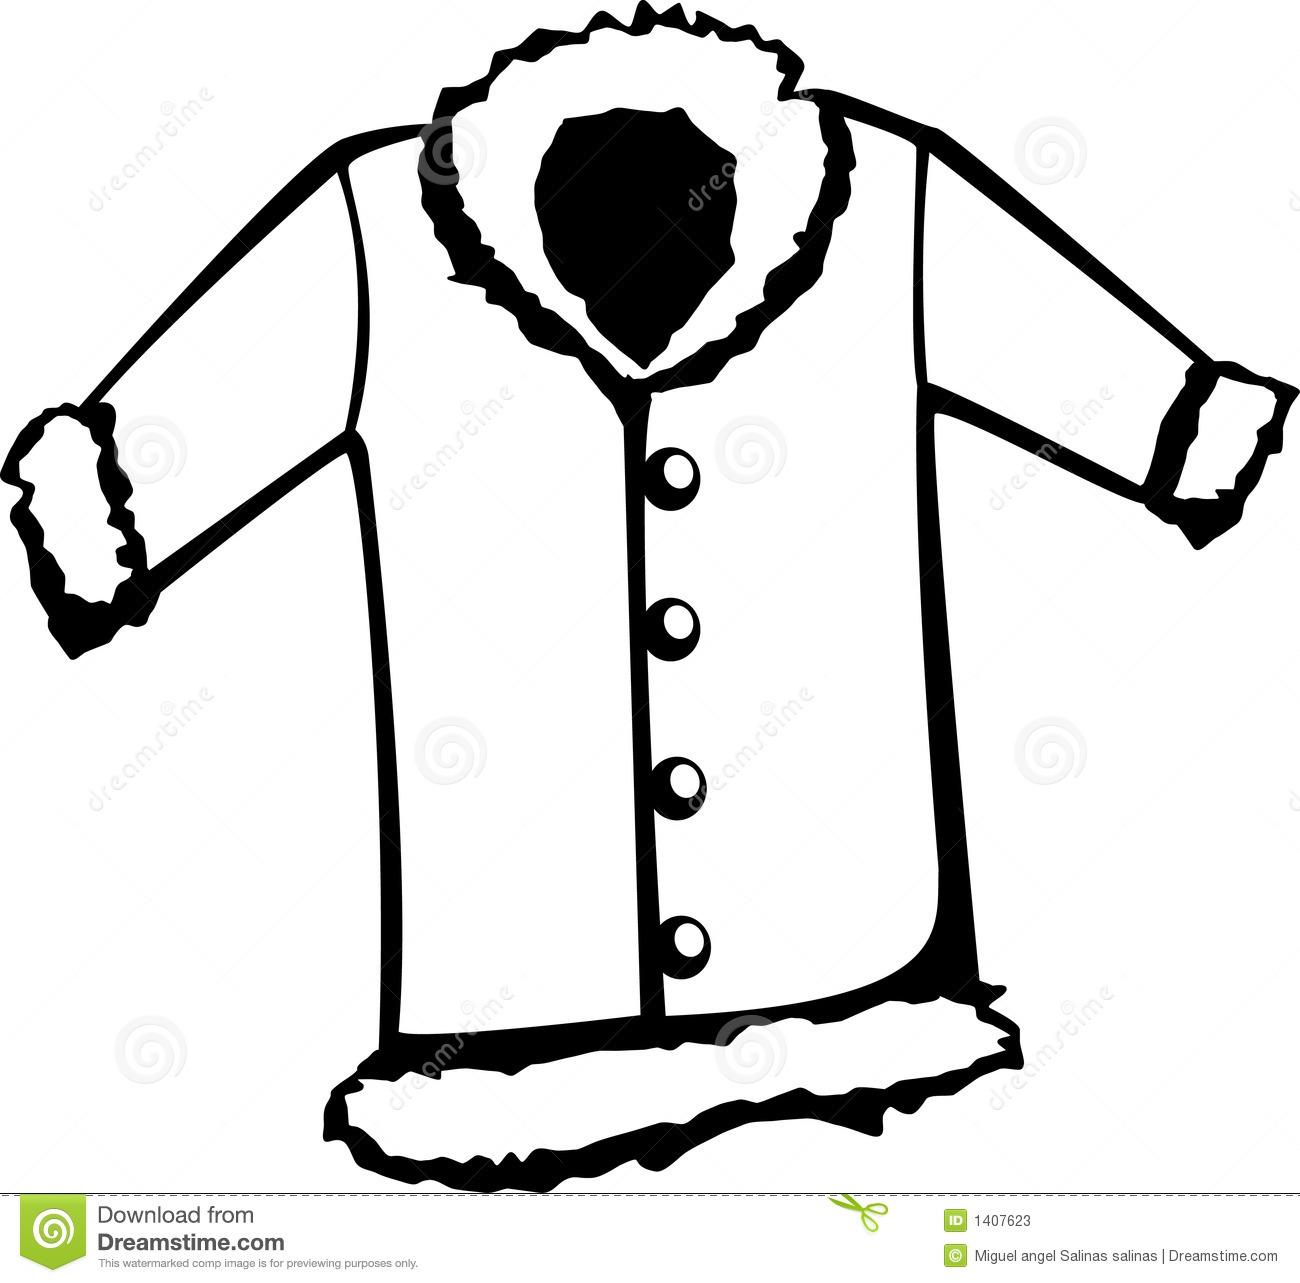 Clip Art Coat Clip Art clip art fur coat clipart kid vector illustration stock photos image 1407623